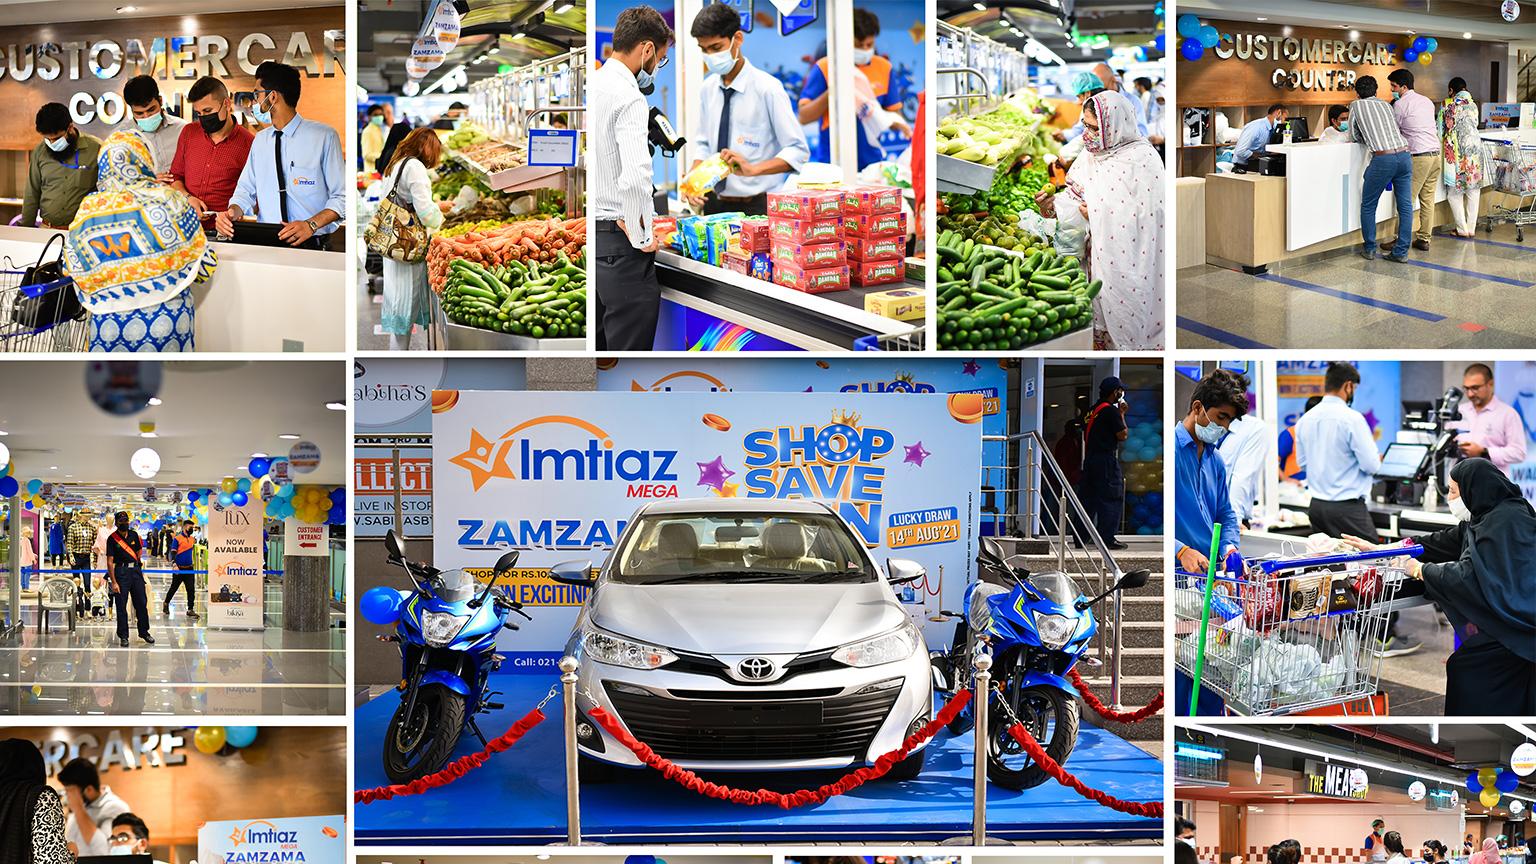 Imtiaz Mega Zamzama – Bringing Grand Lucky Draw For Everyone